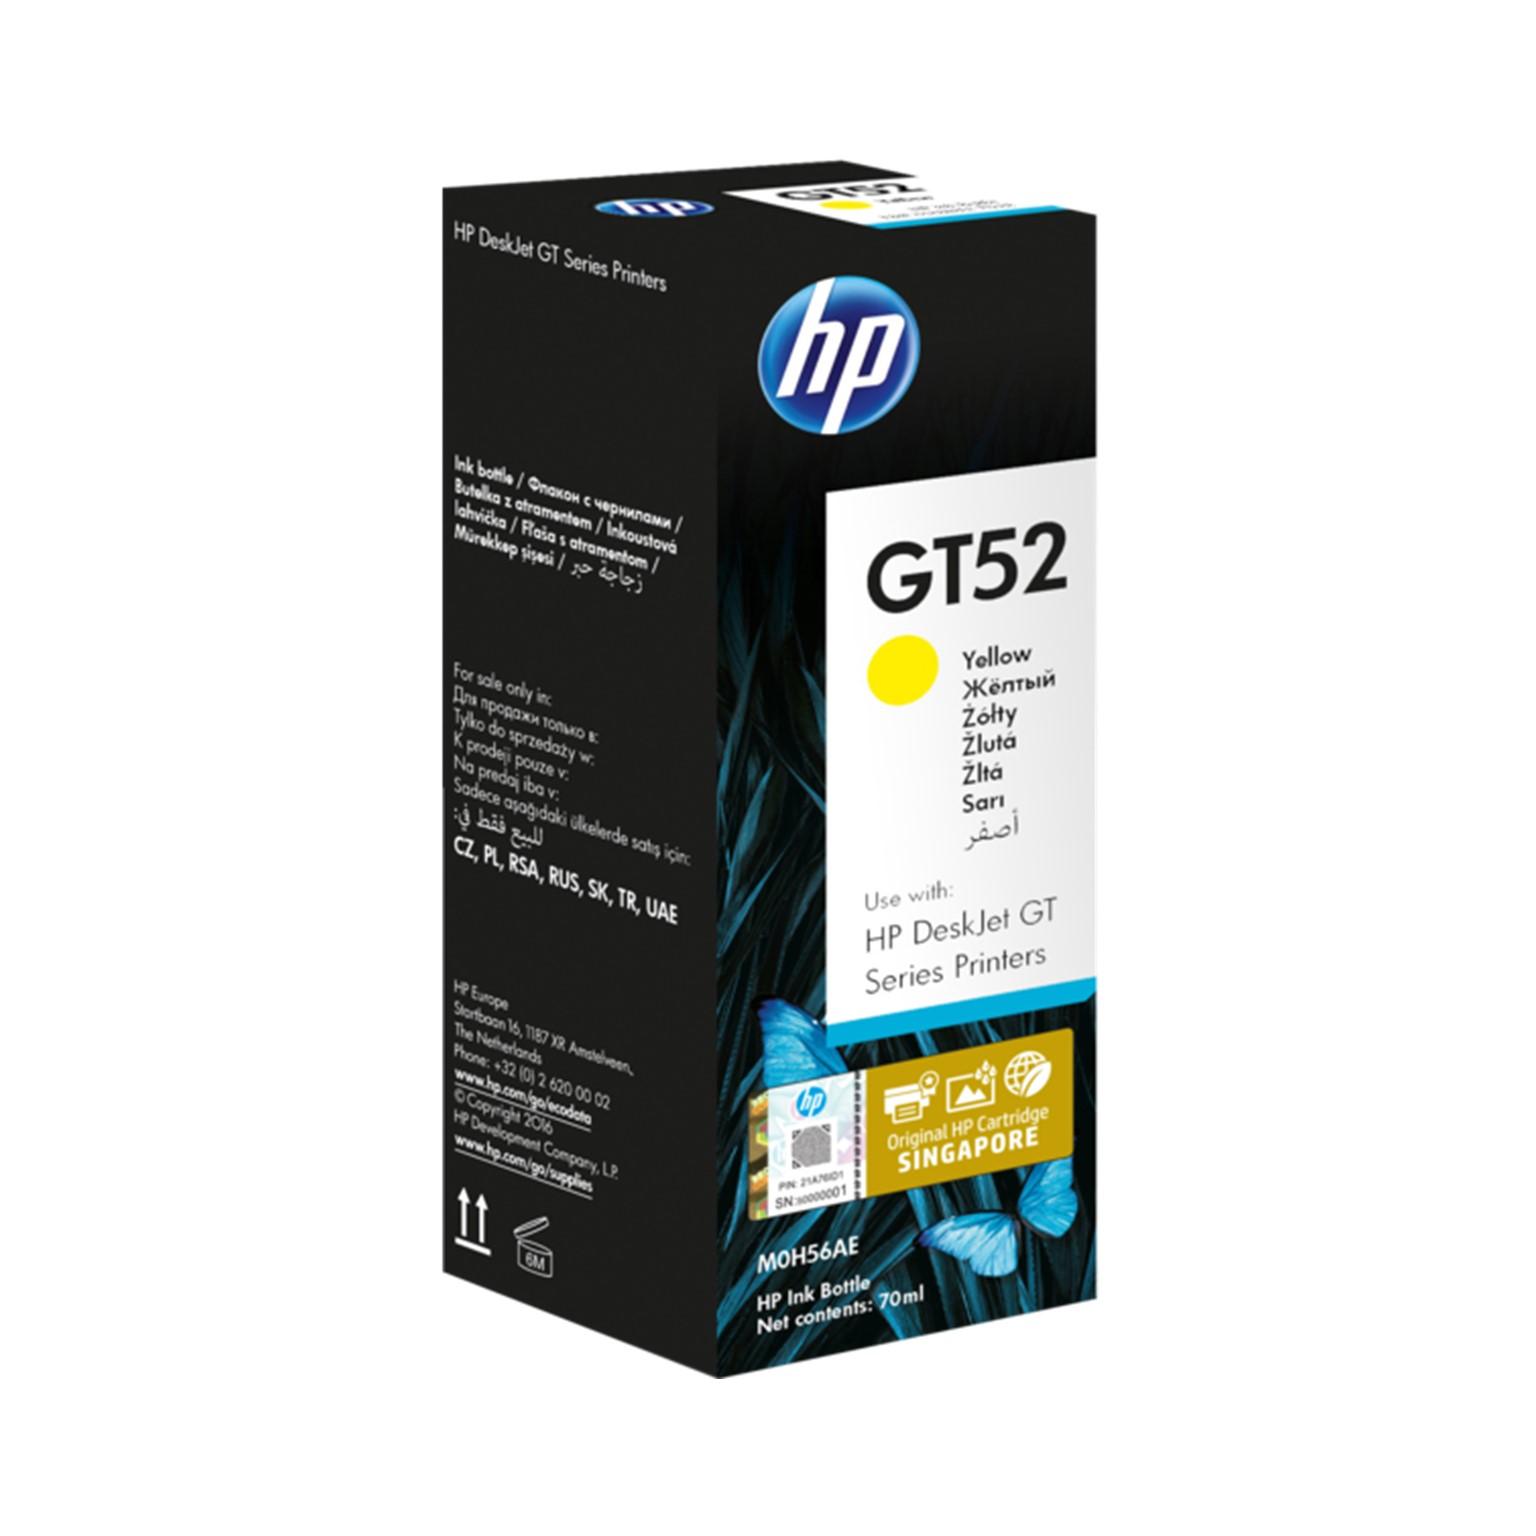 HP GT52 Yellow